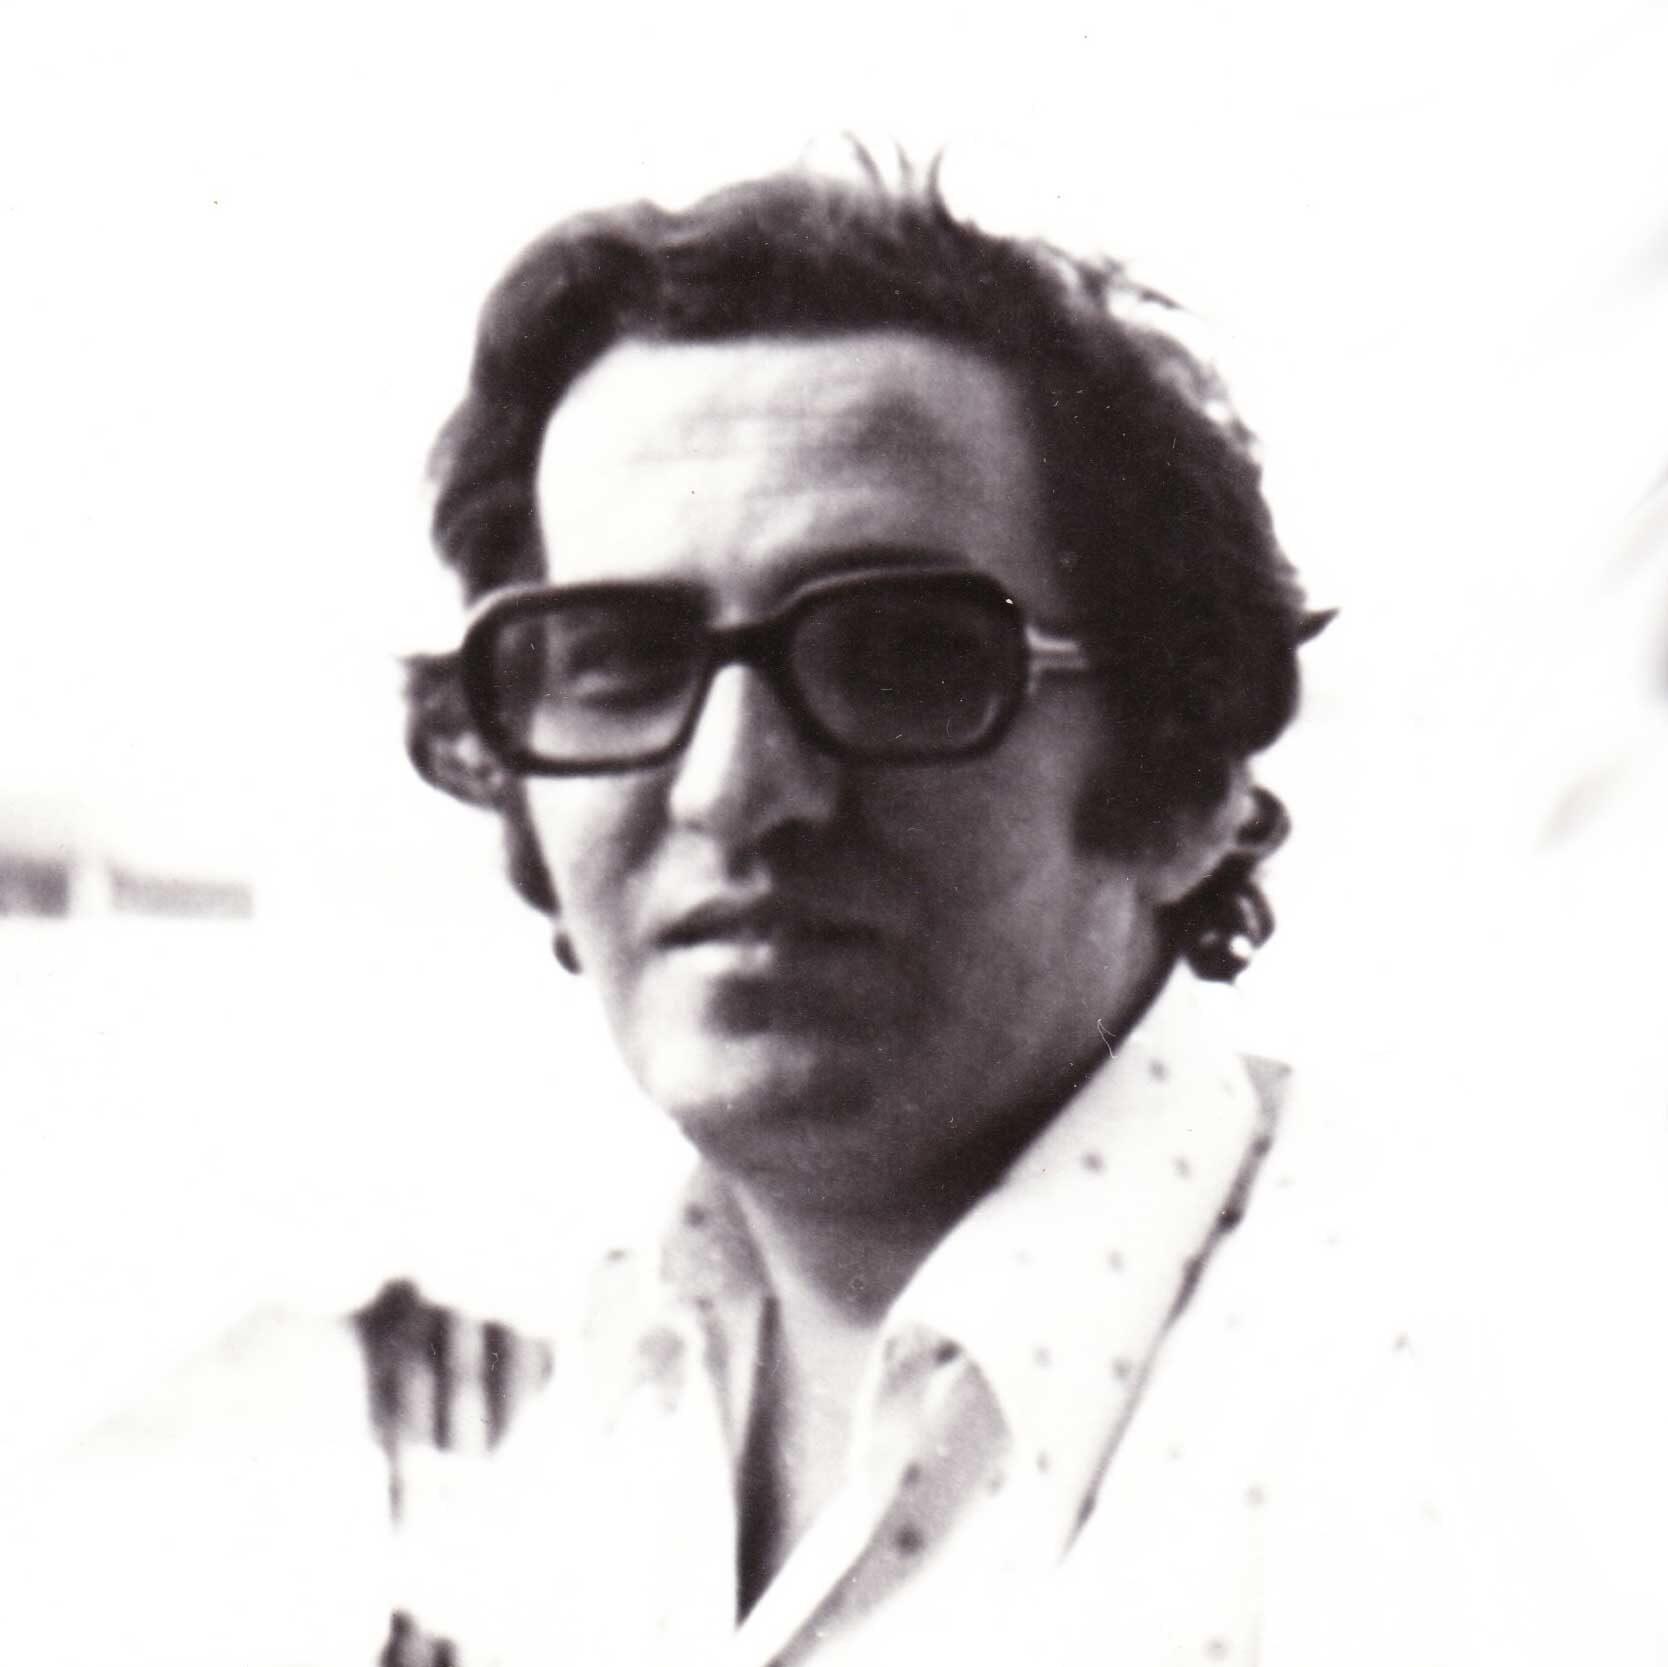 Leonid Sarvarian